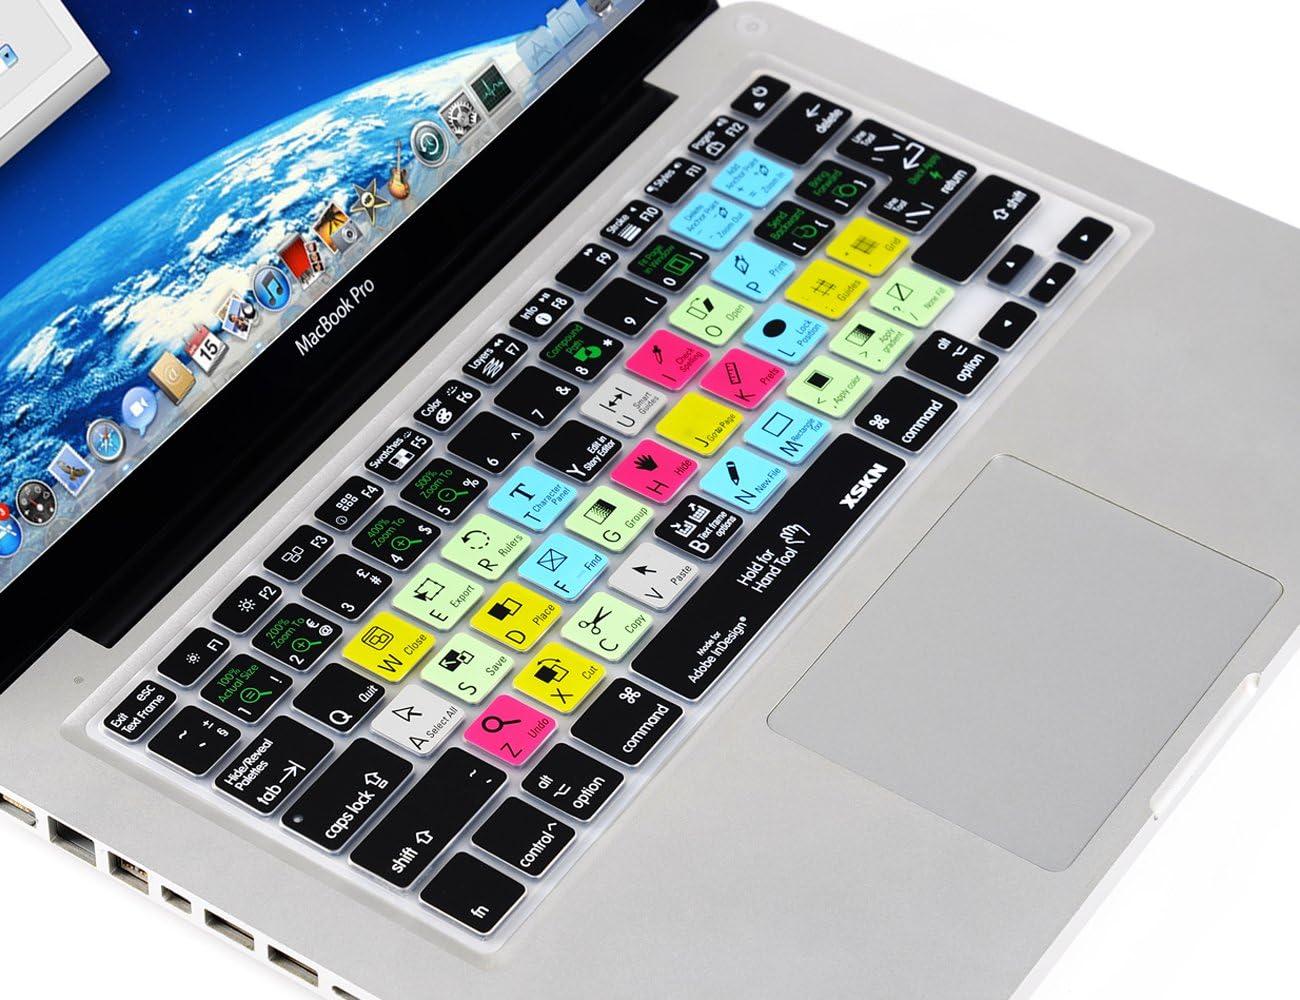 mengersty EU Adobe InDesign Functional Hotkey Shortcuts Keyboard Keyboard Cover Protector